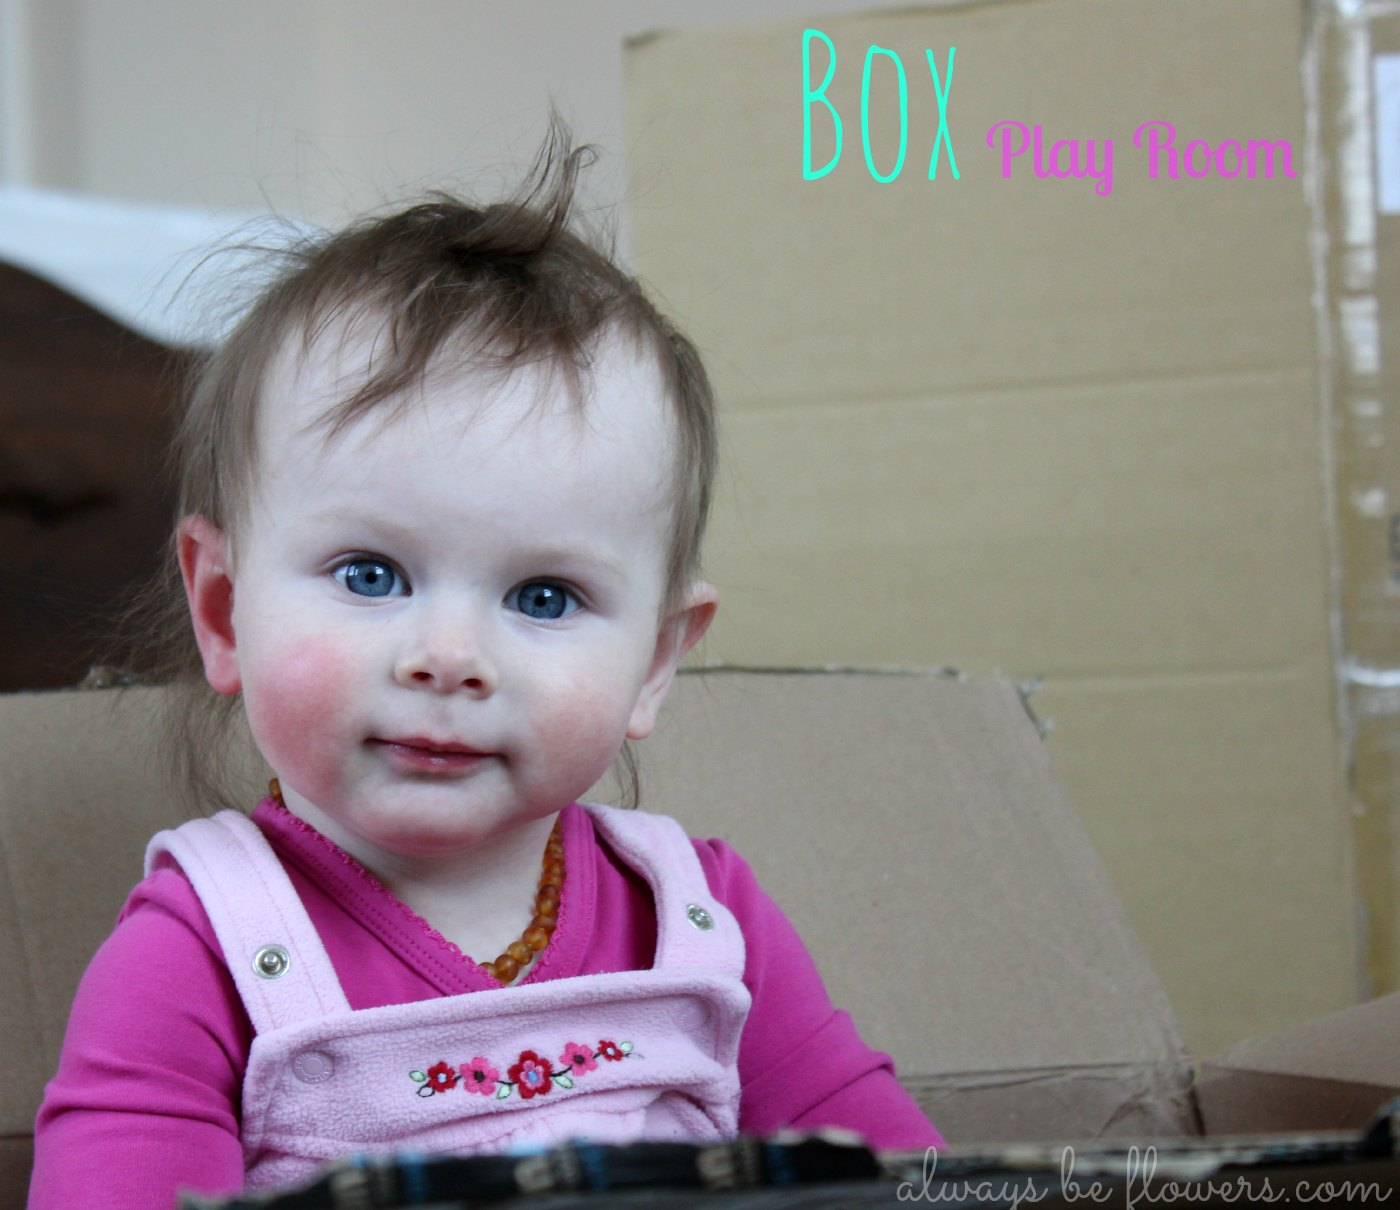 2014-box-play-room-3.jpg